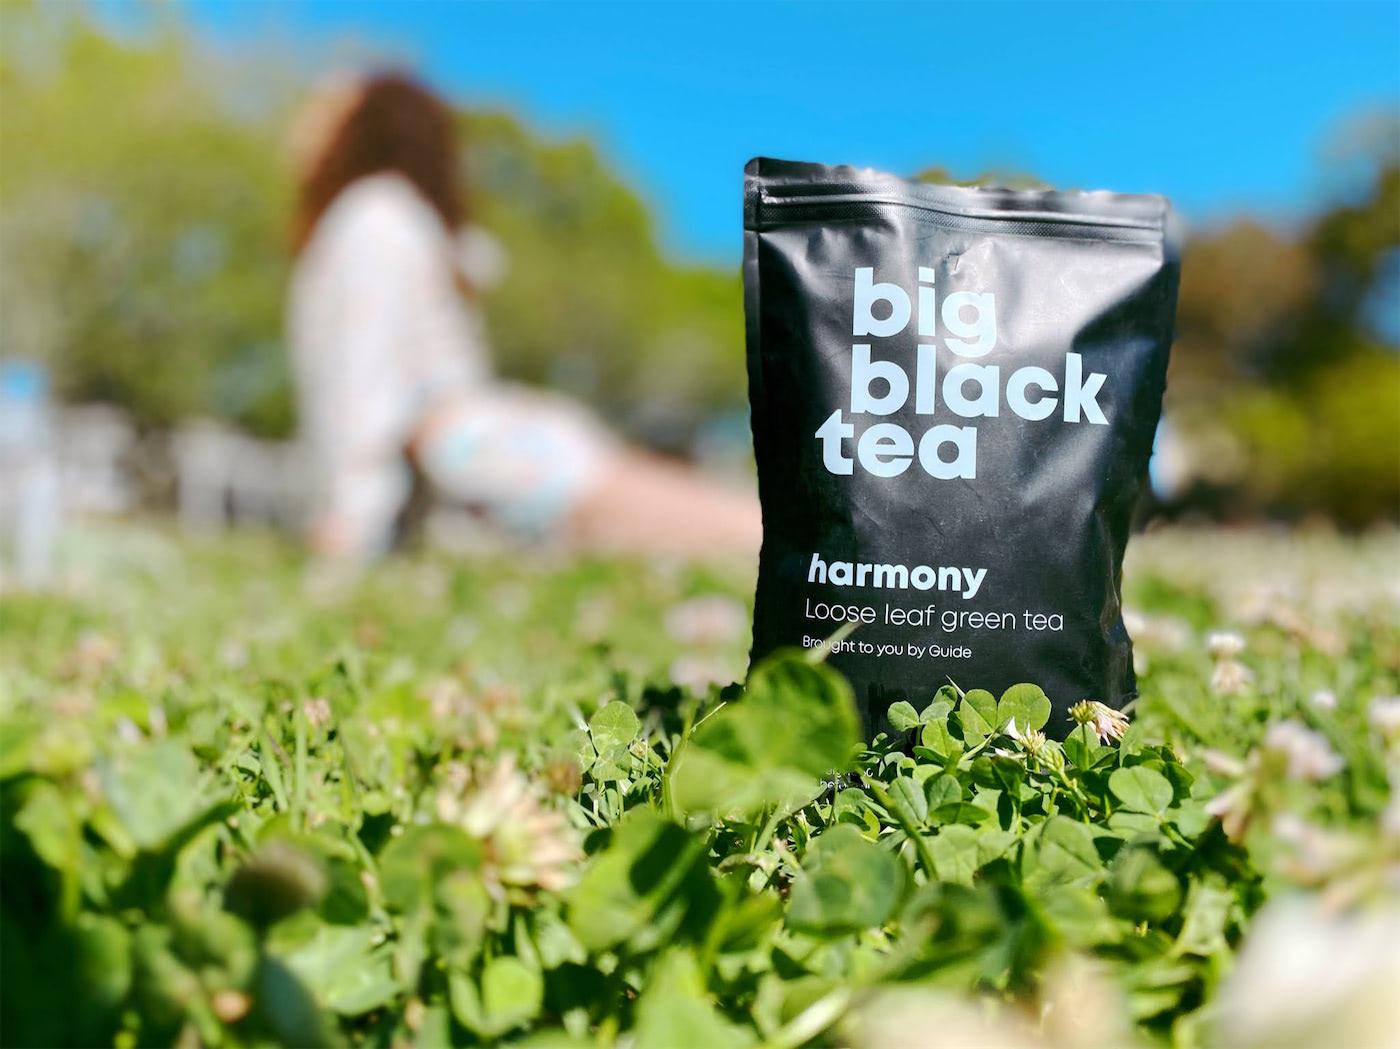 A bag of big black tea sitting on a bench